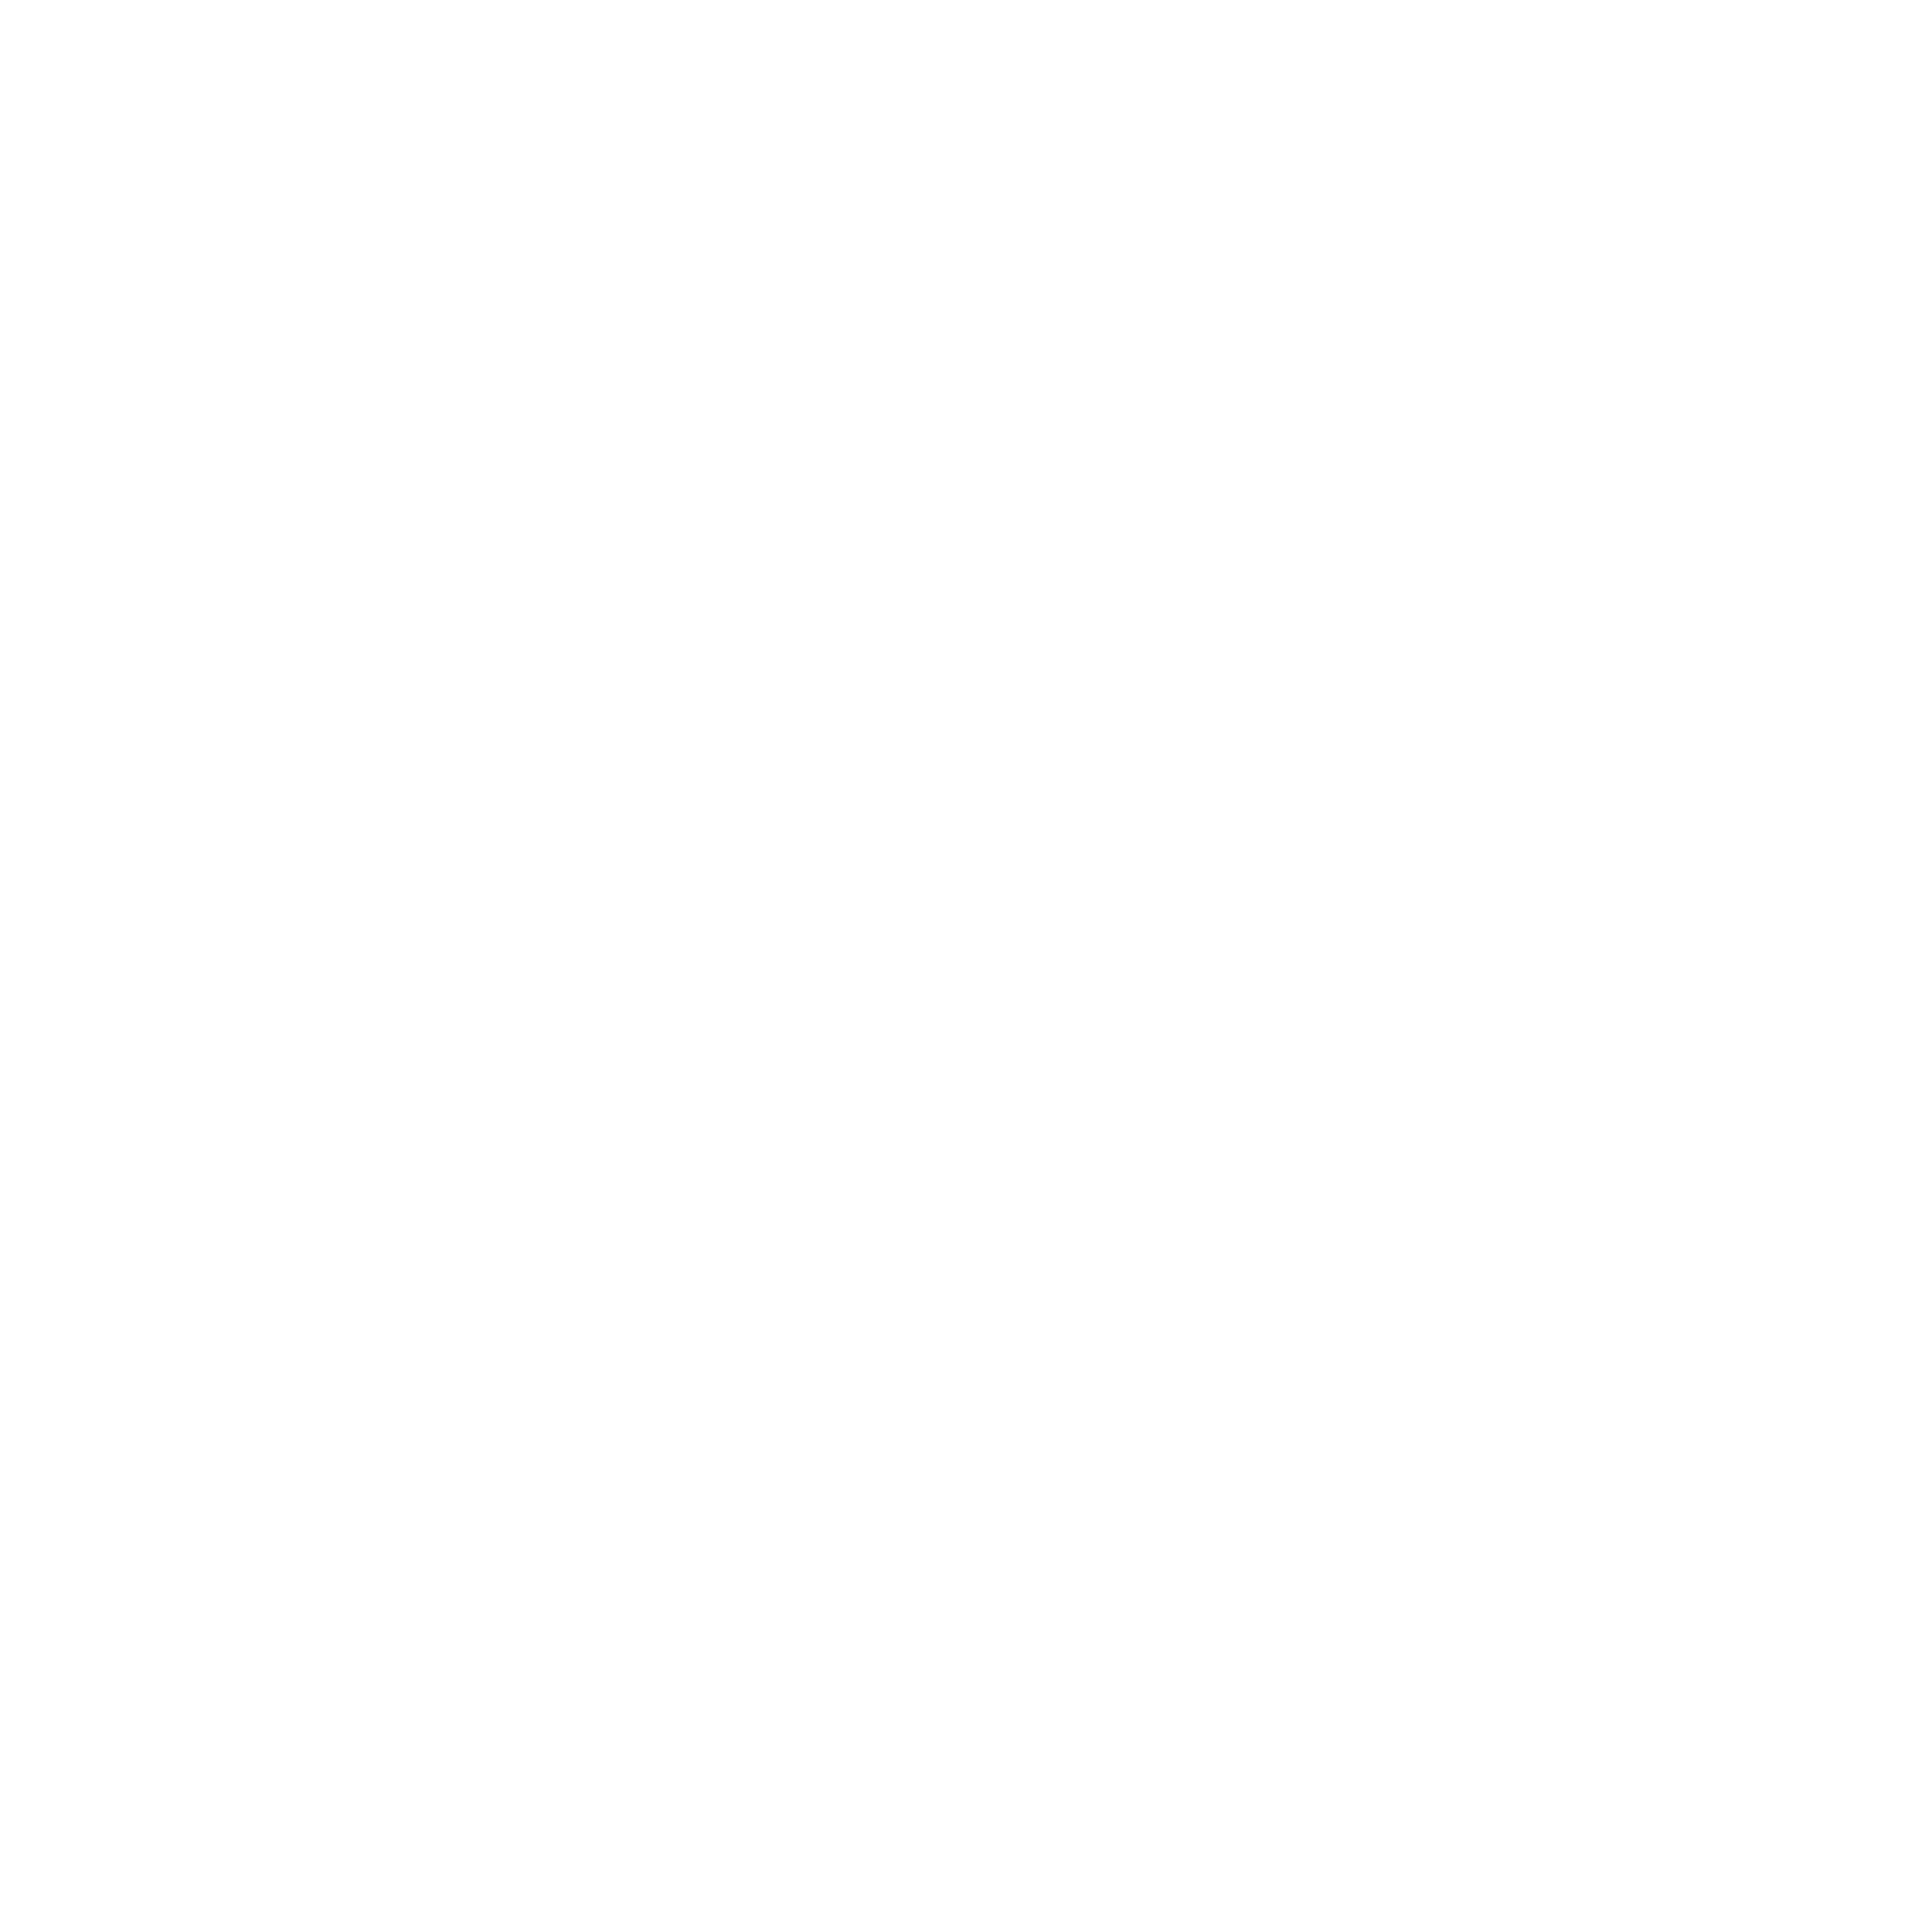 1 logo white png